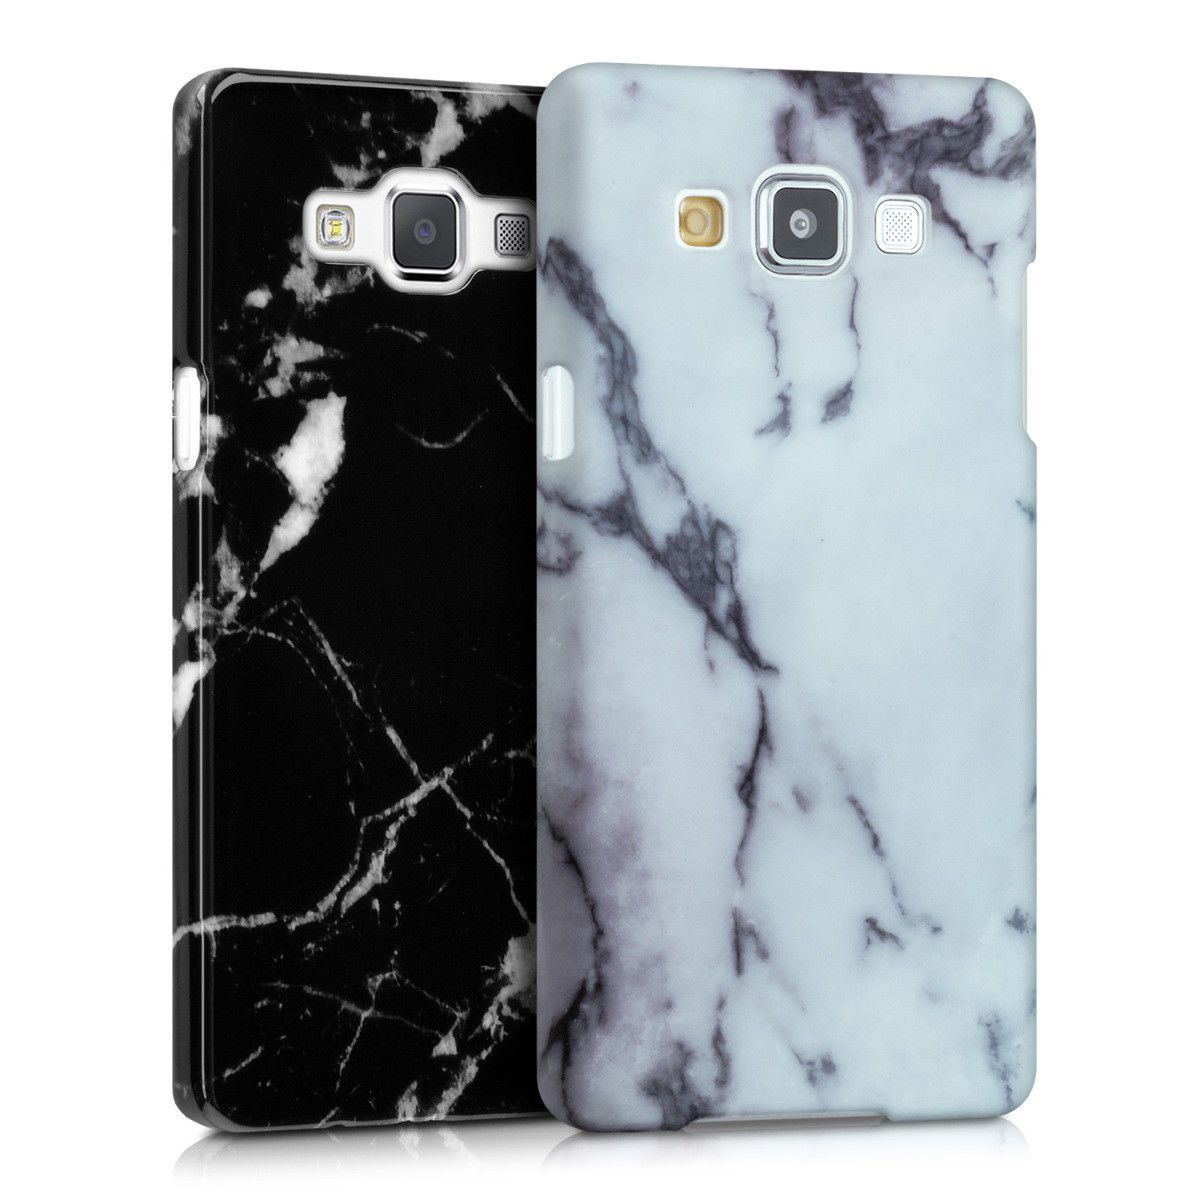 5 4 Hard Cover For Samsung Galaxy A5 2015 Case Back Shell Bumper Mobile Phone Ebay Electronics Samsung Galaxy Samsung Ebay